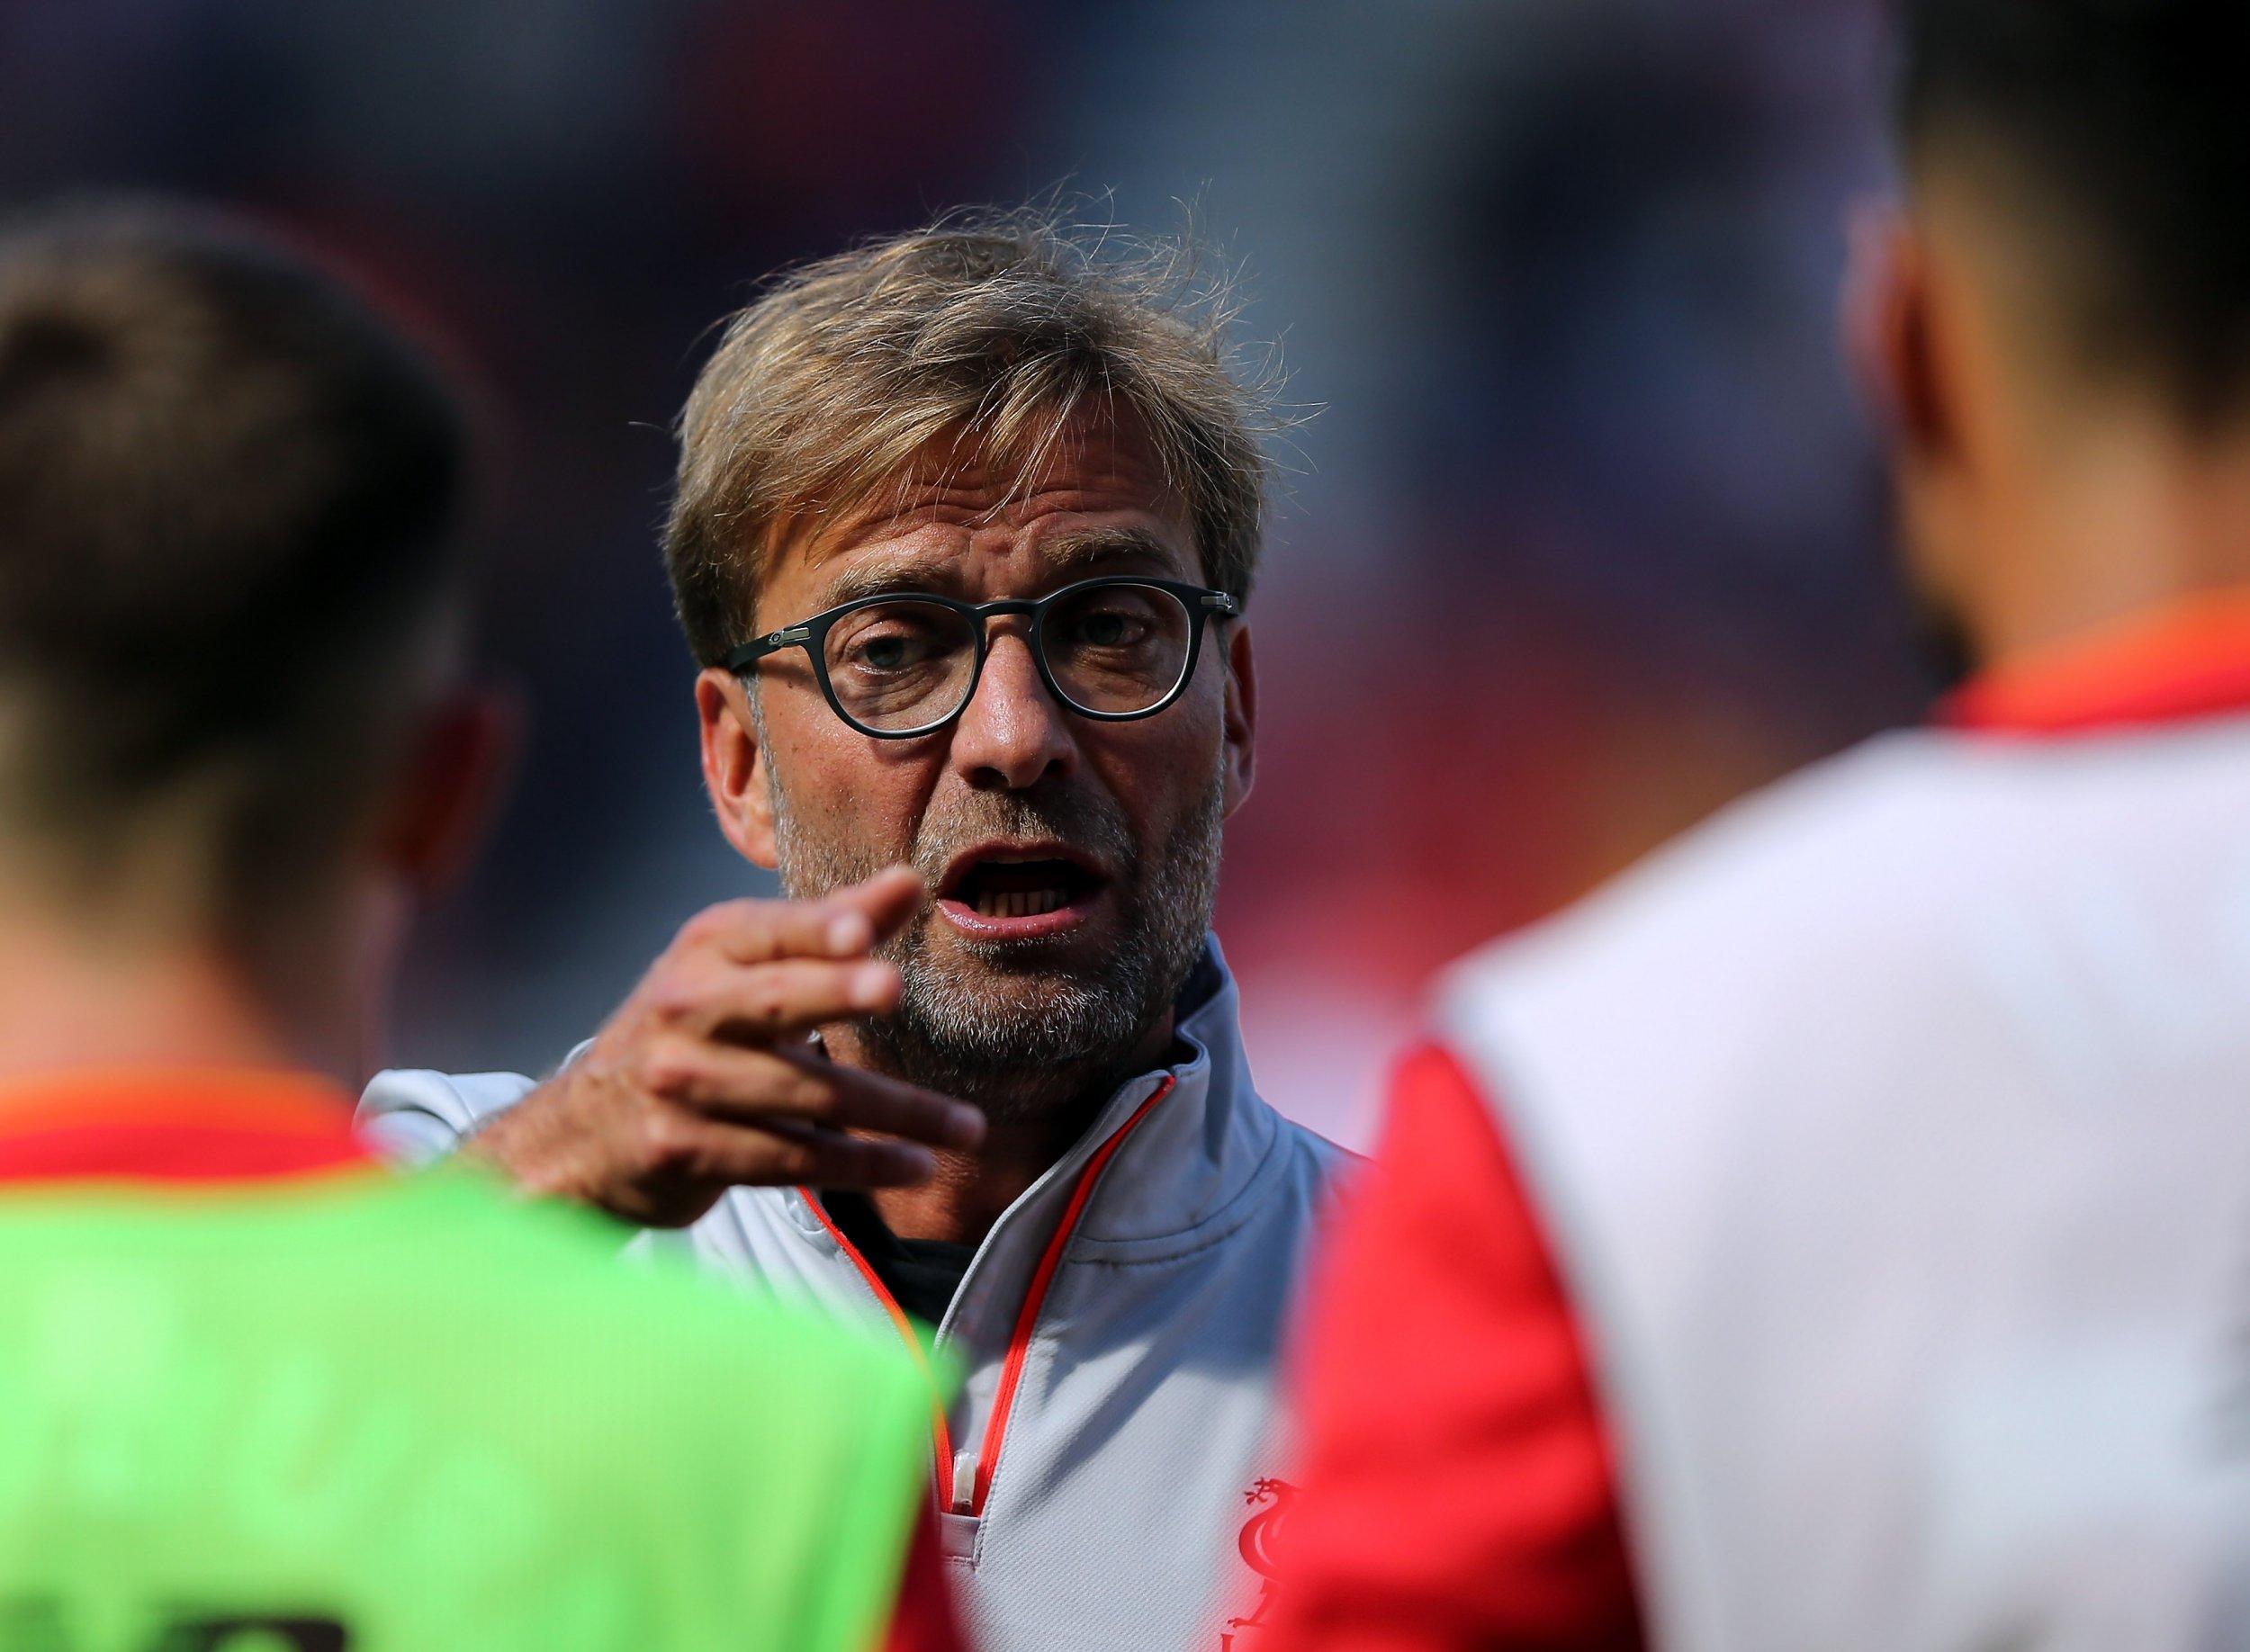 Liverpool: Jurgen Klopp Bids £33 Million For Euro 2016 Winner